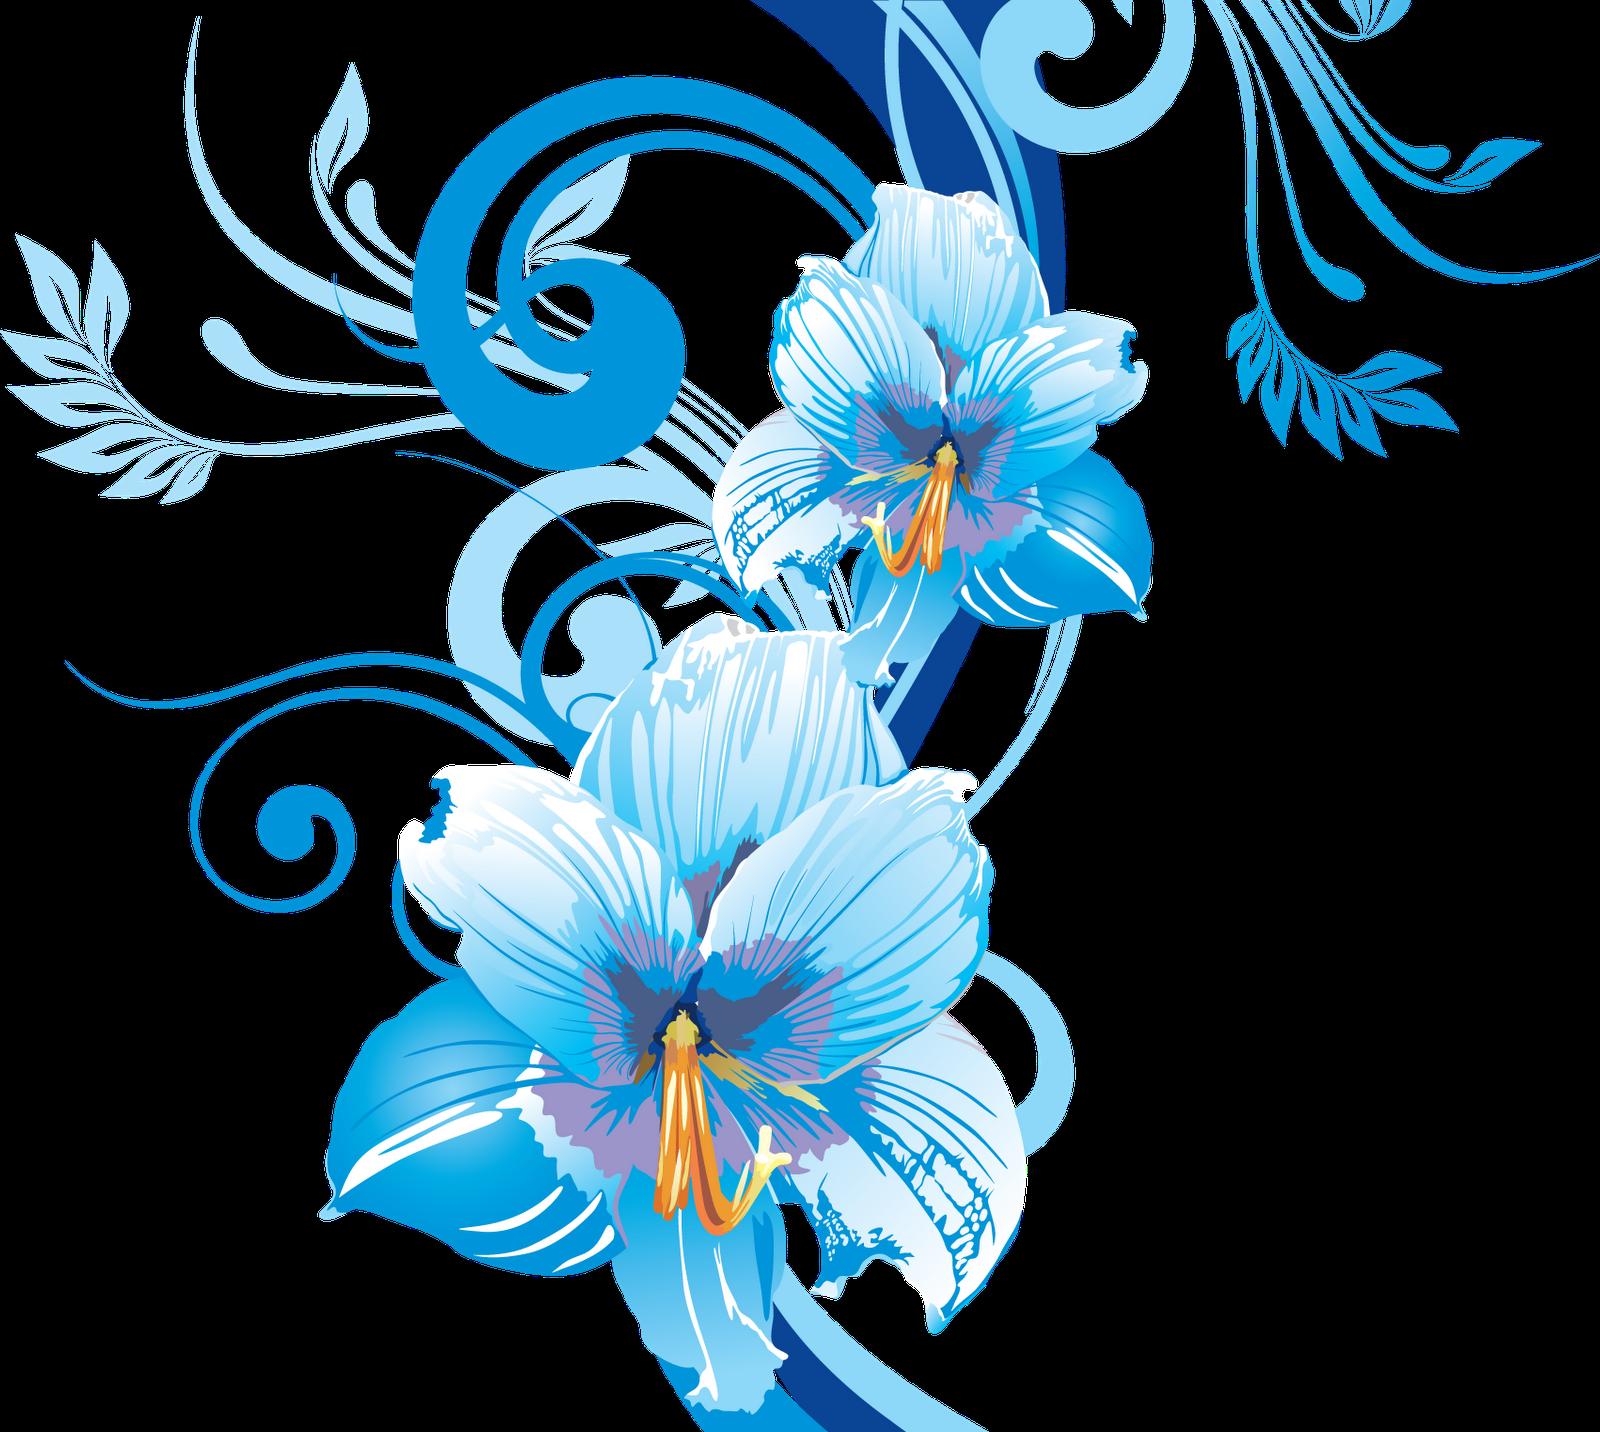 Blue flower vectors various desings pictures 4767 transparentpng blue flower vectors various desings pictures izmirmasajfo